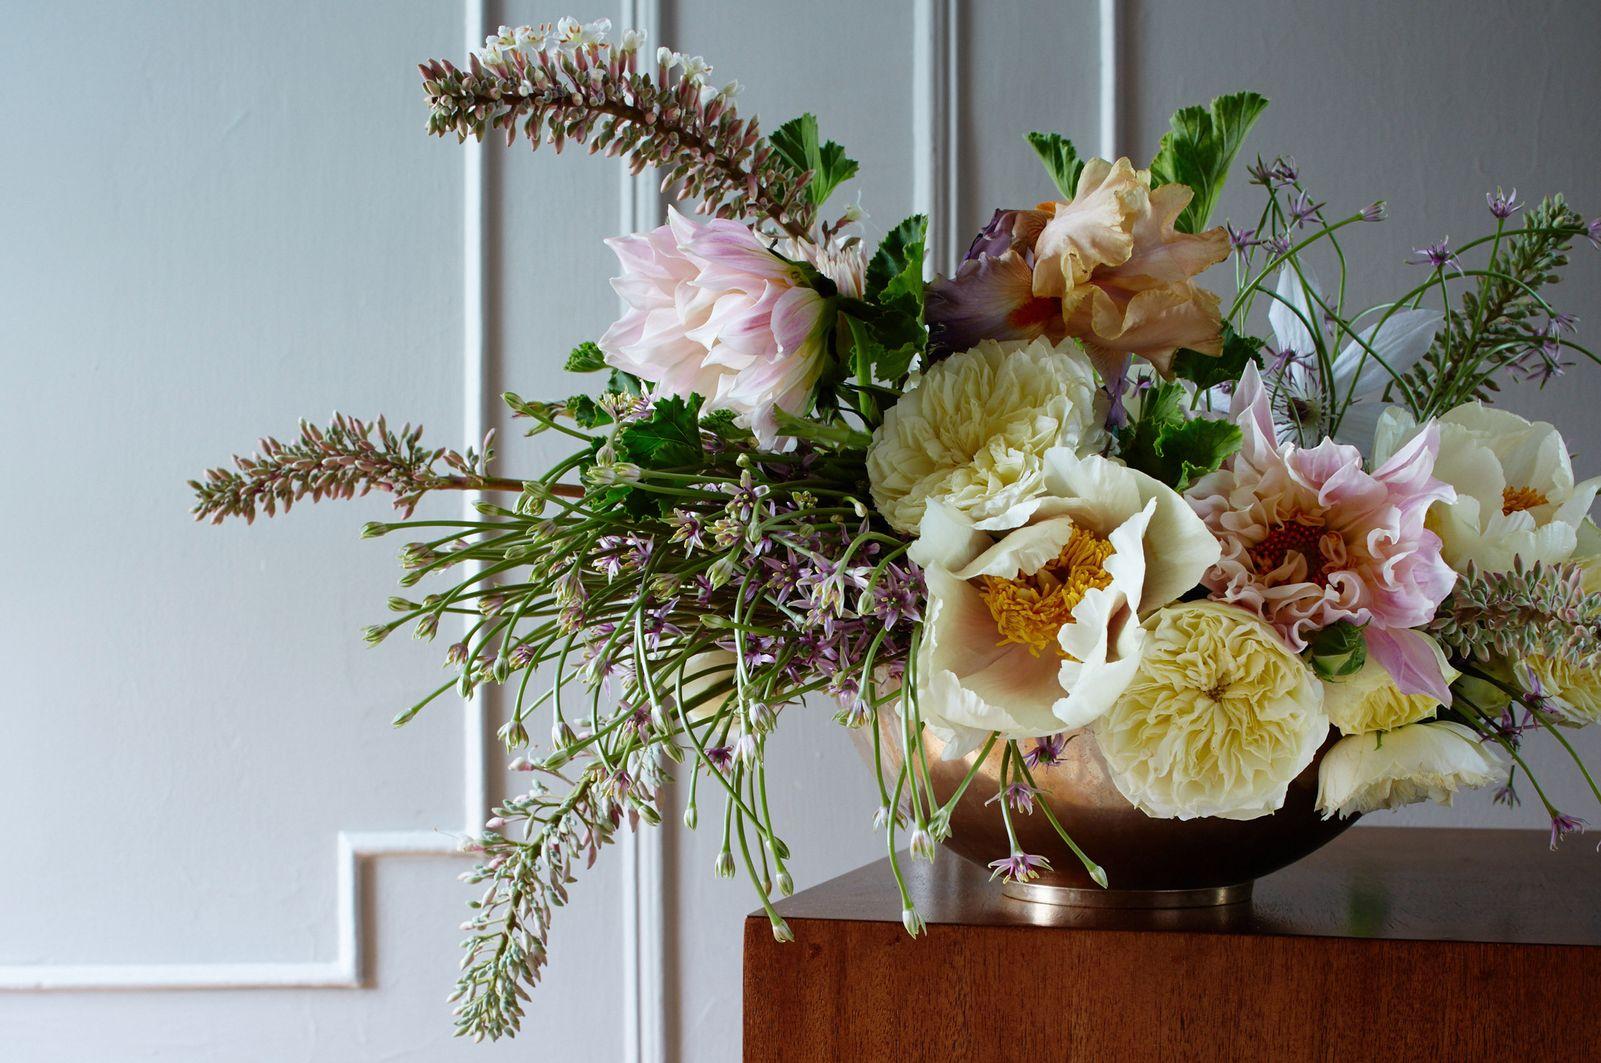 ChristopherWhite_floral_Home.jpg